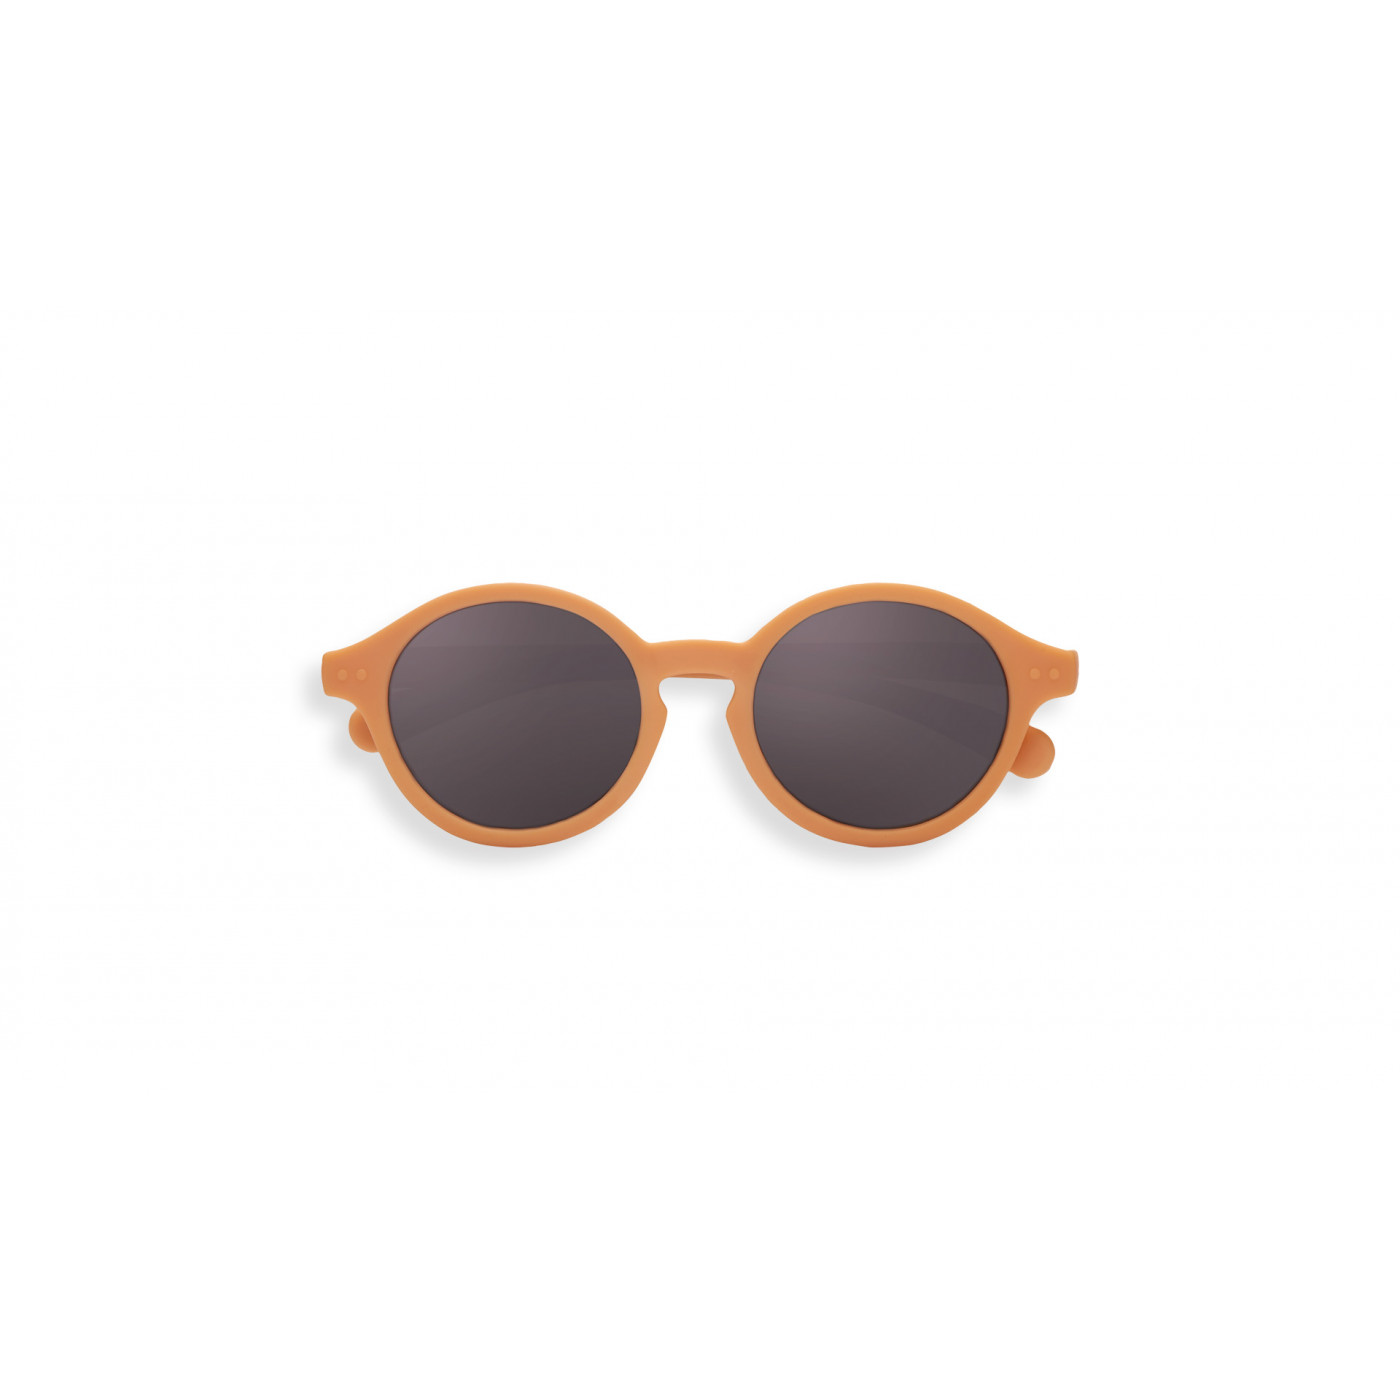 IZIPIZI brille #E SUN Kids+ Sunny Orange